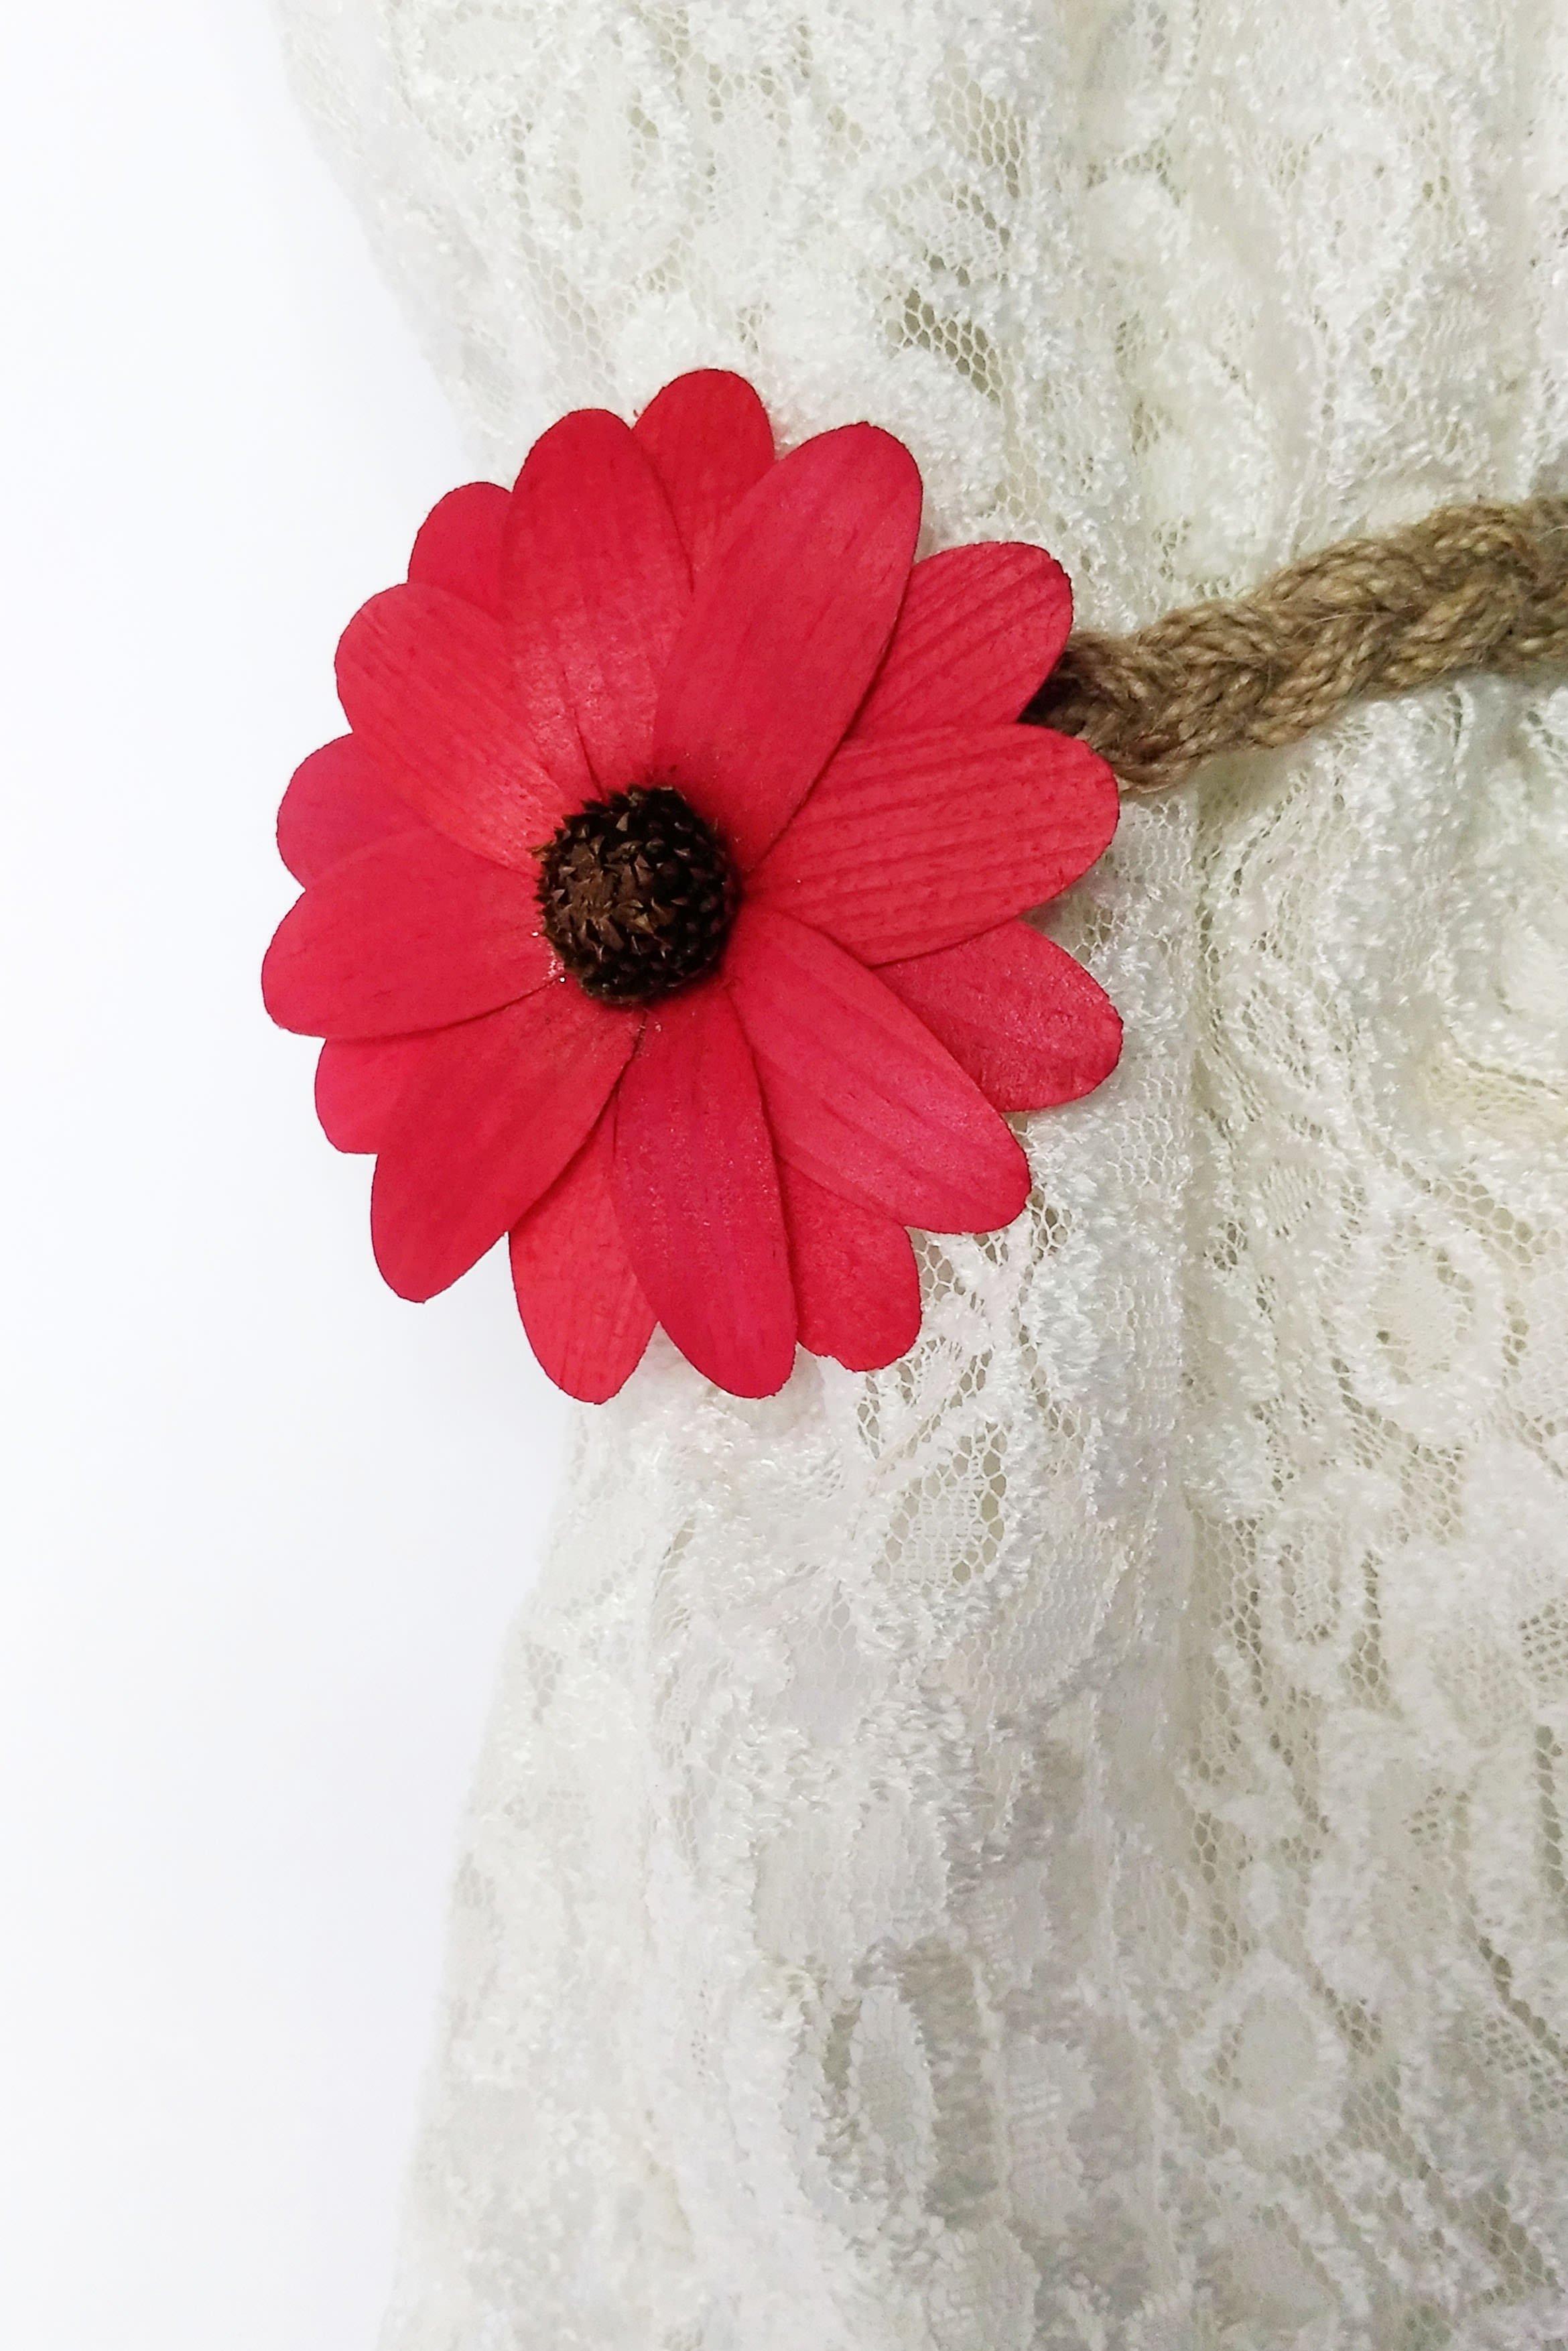 Diy Magnetic Curtain Tie Backs Dead Simple That Looks Great